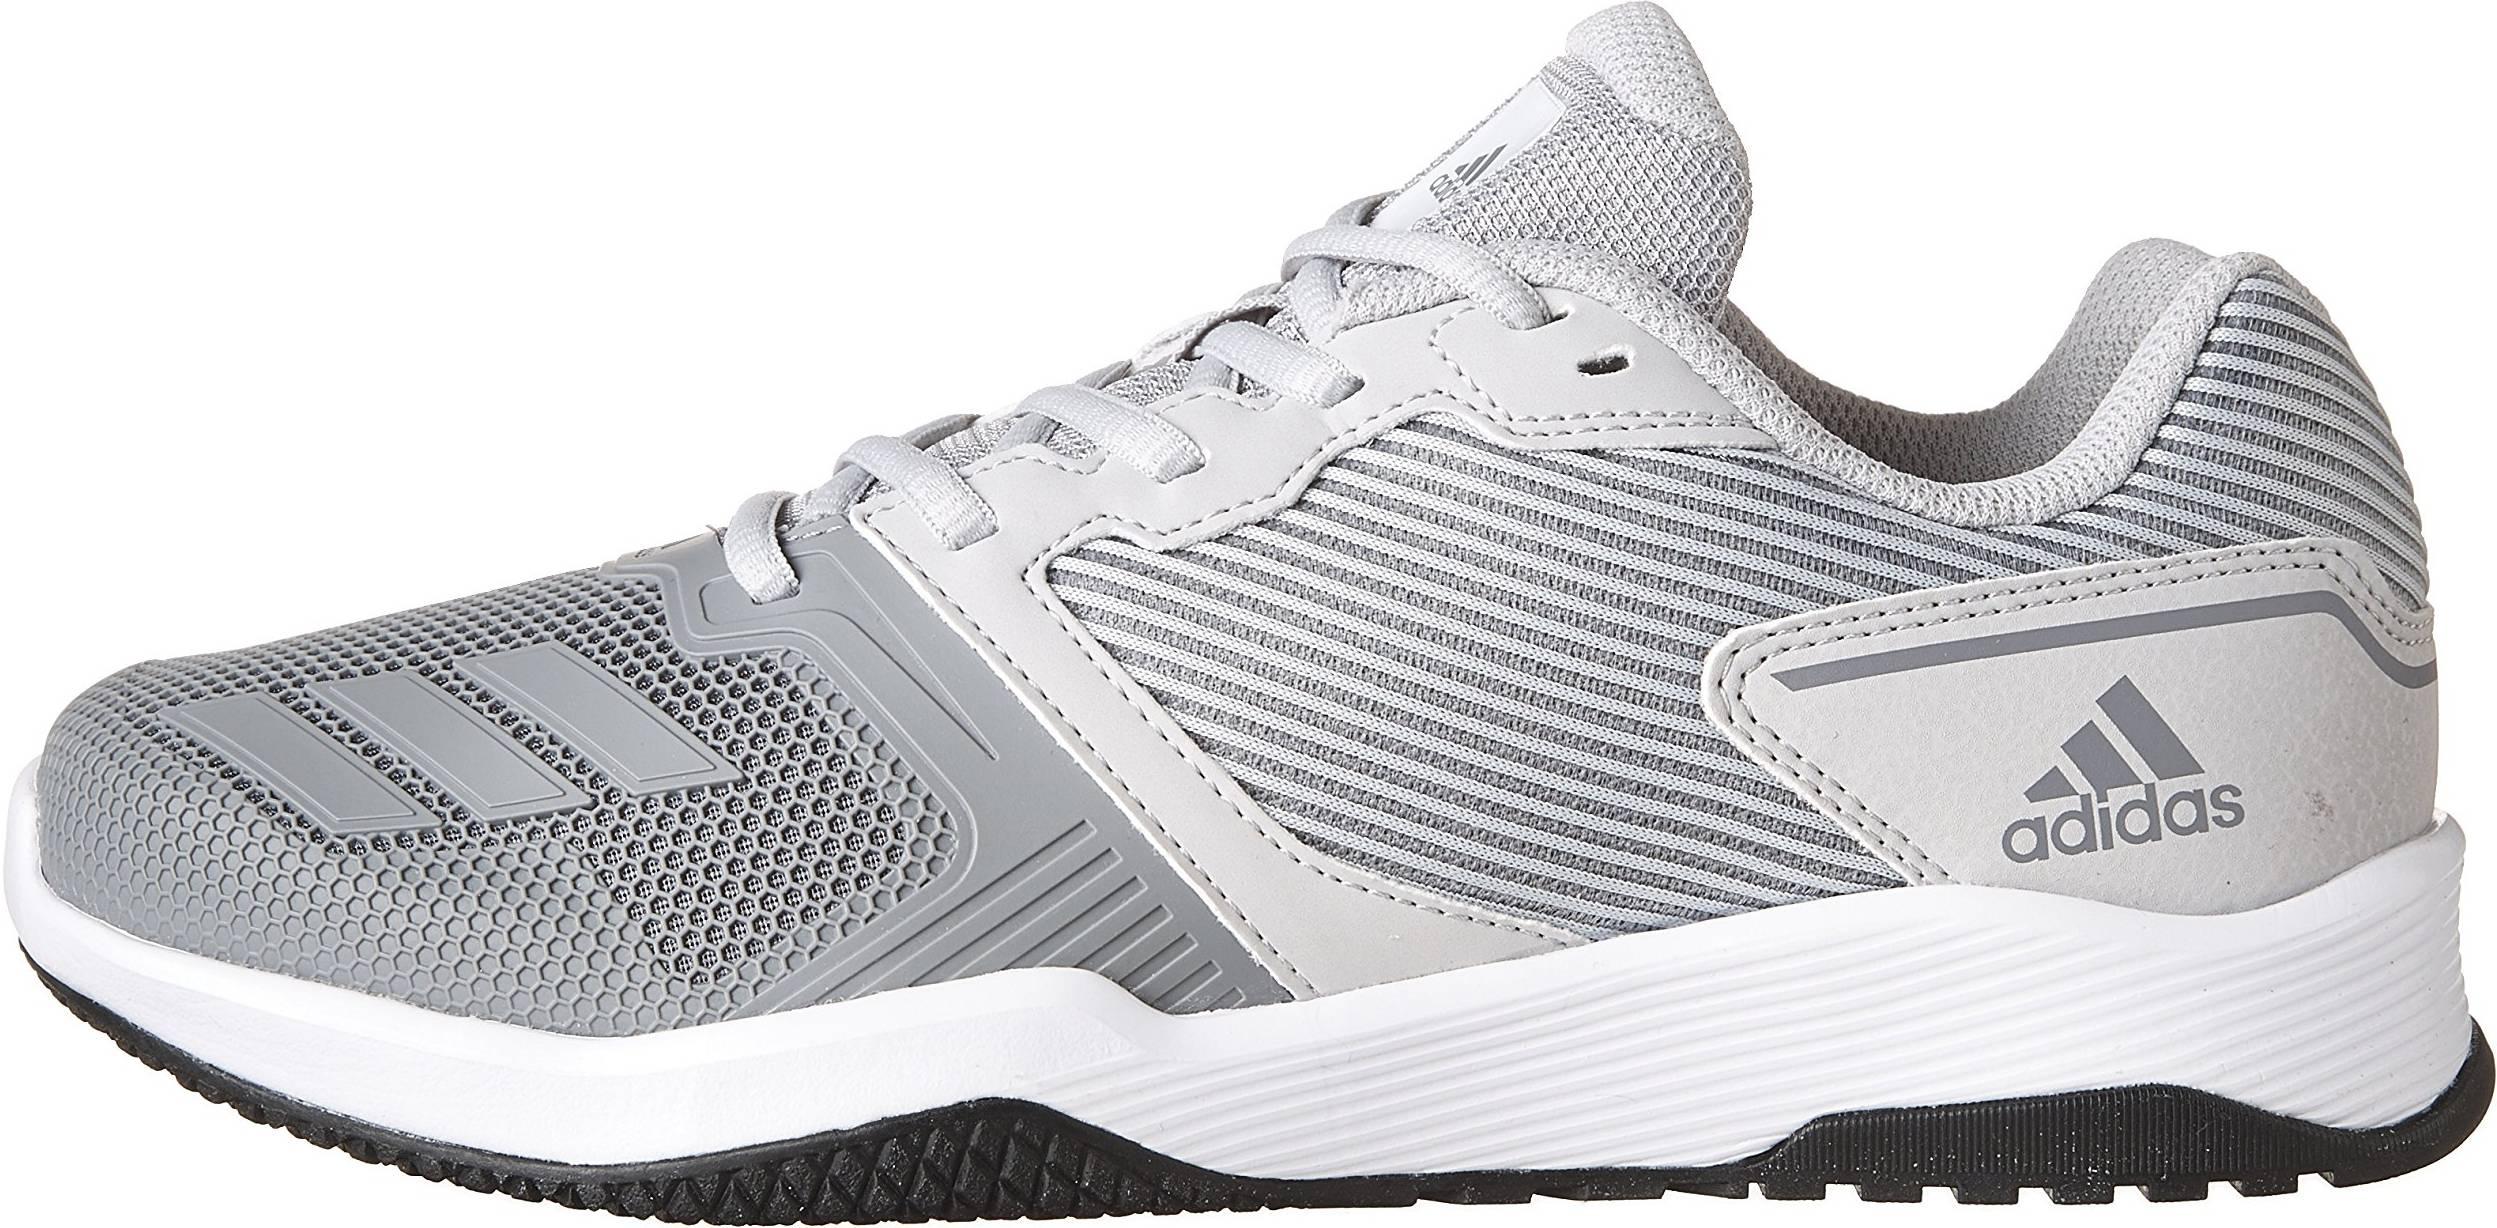 20 Adidas training shoes - Save 52% | RunRepeat